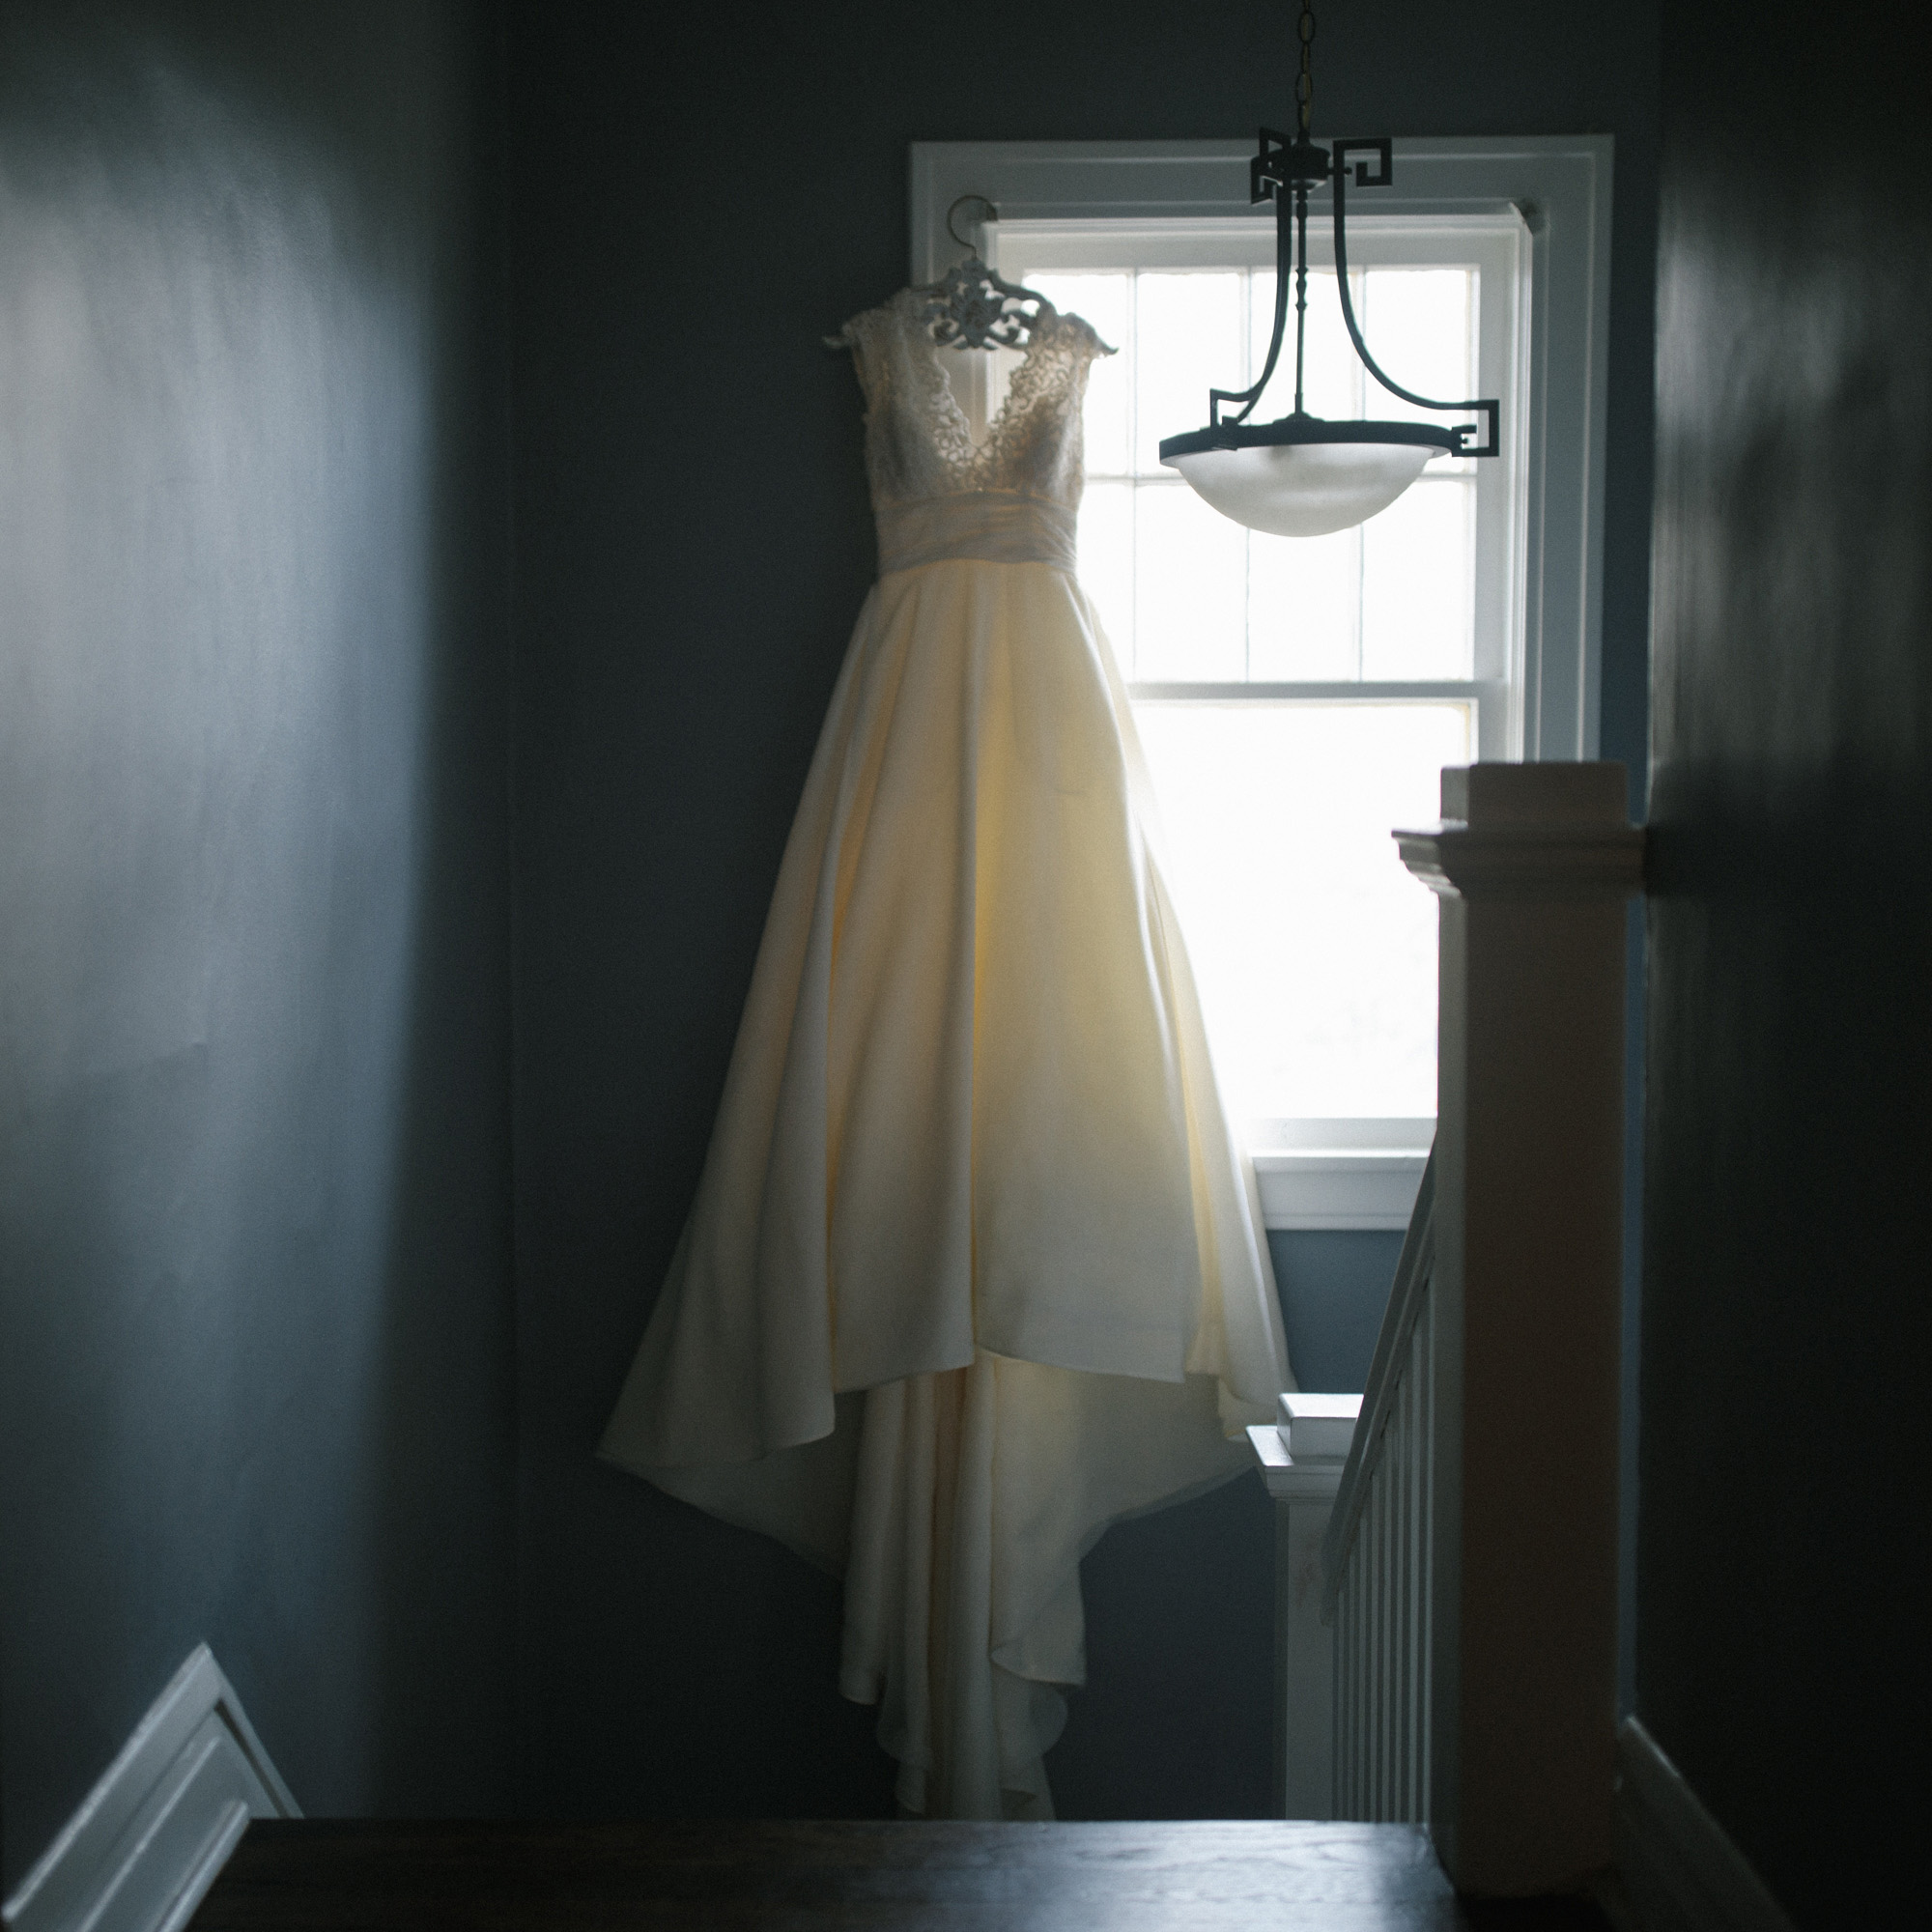 Alec_Vanderboom_kansas_city_hip_wedding_photos-0010.jpg